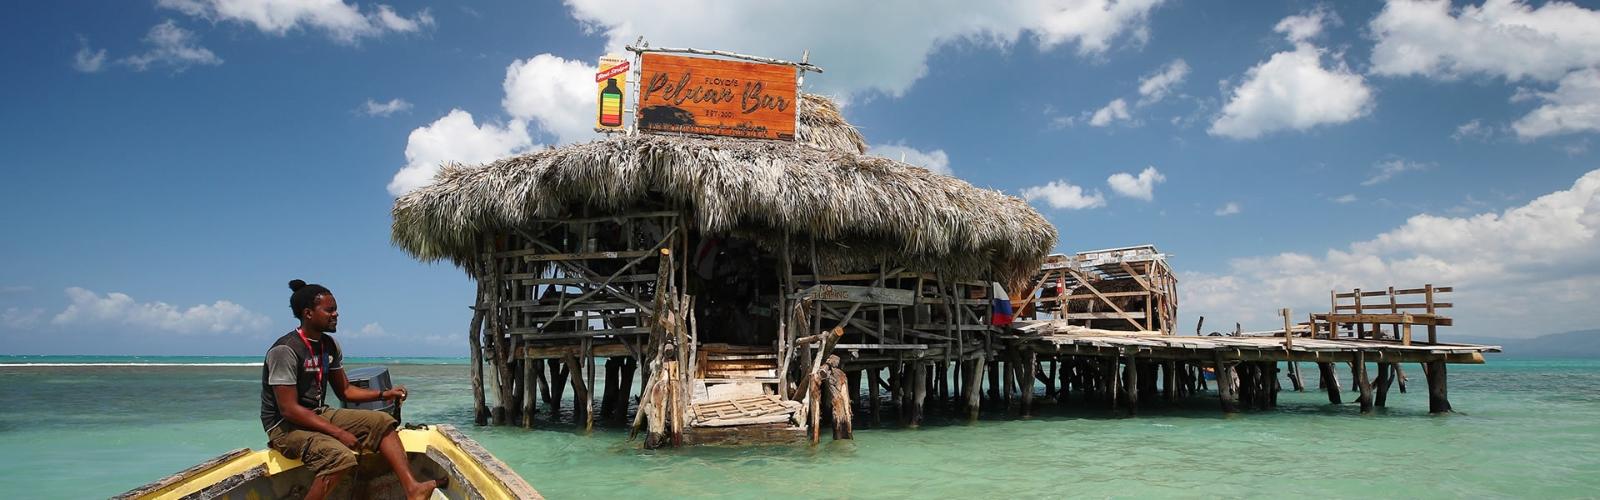 Floyd's Pelican Bar floats around a mile off Jamaica. Credit: Virgin Holidays